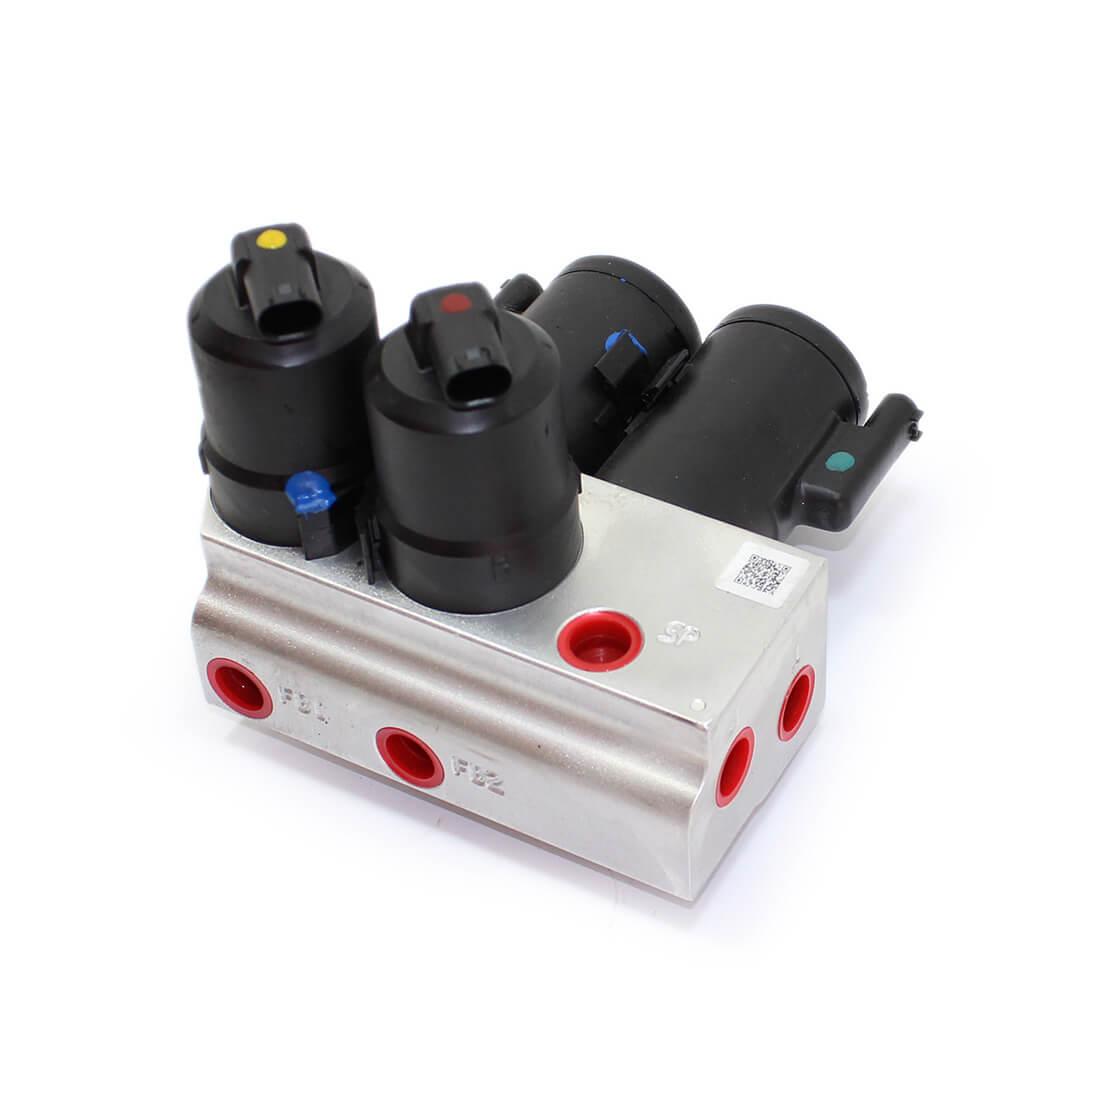 00731 Bloque Distribuidor Valvulas Abc Mercedes W220 R230 W215 Cosmoparts A2209970136 A2209970036 A2203200358 A2203280031 1.jpg